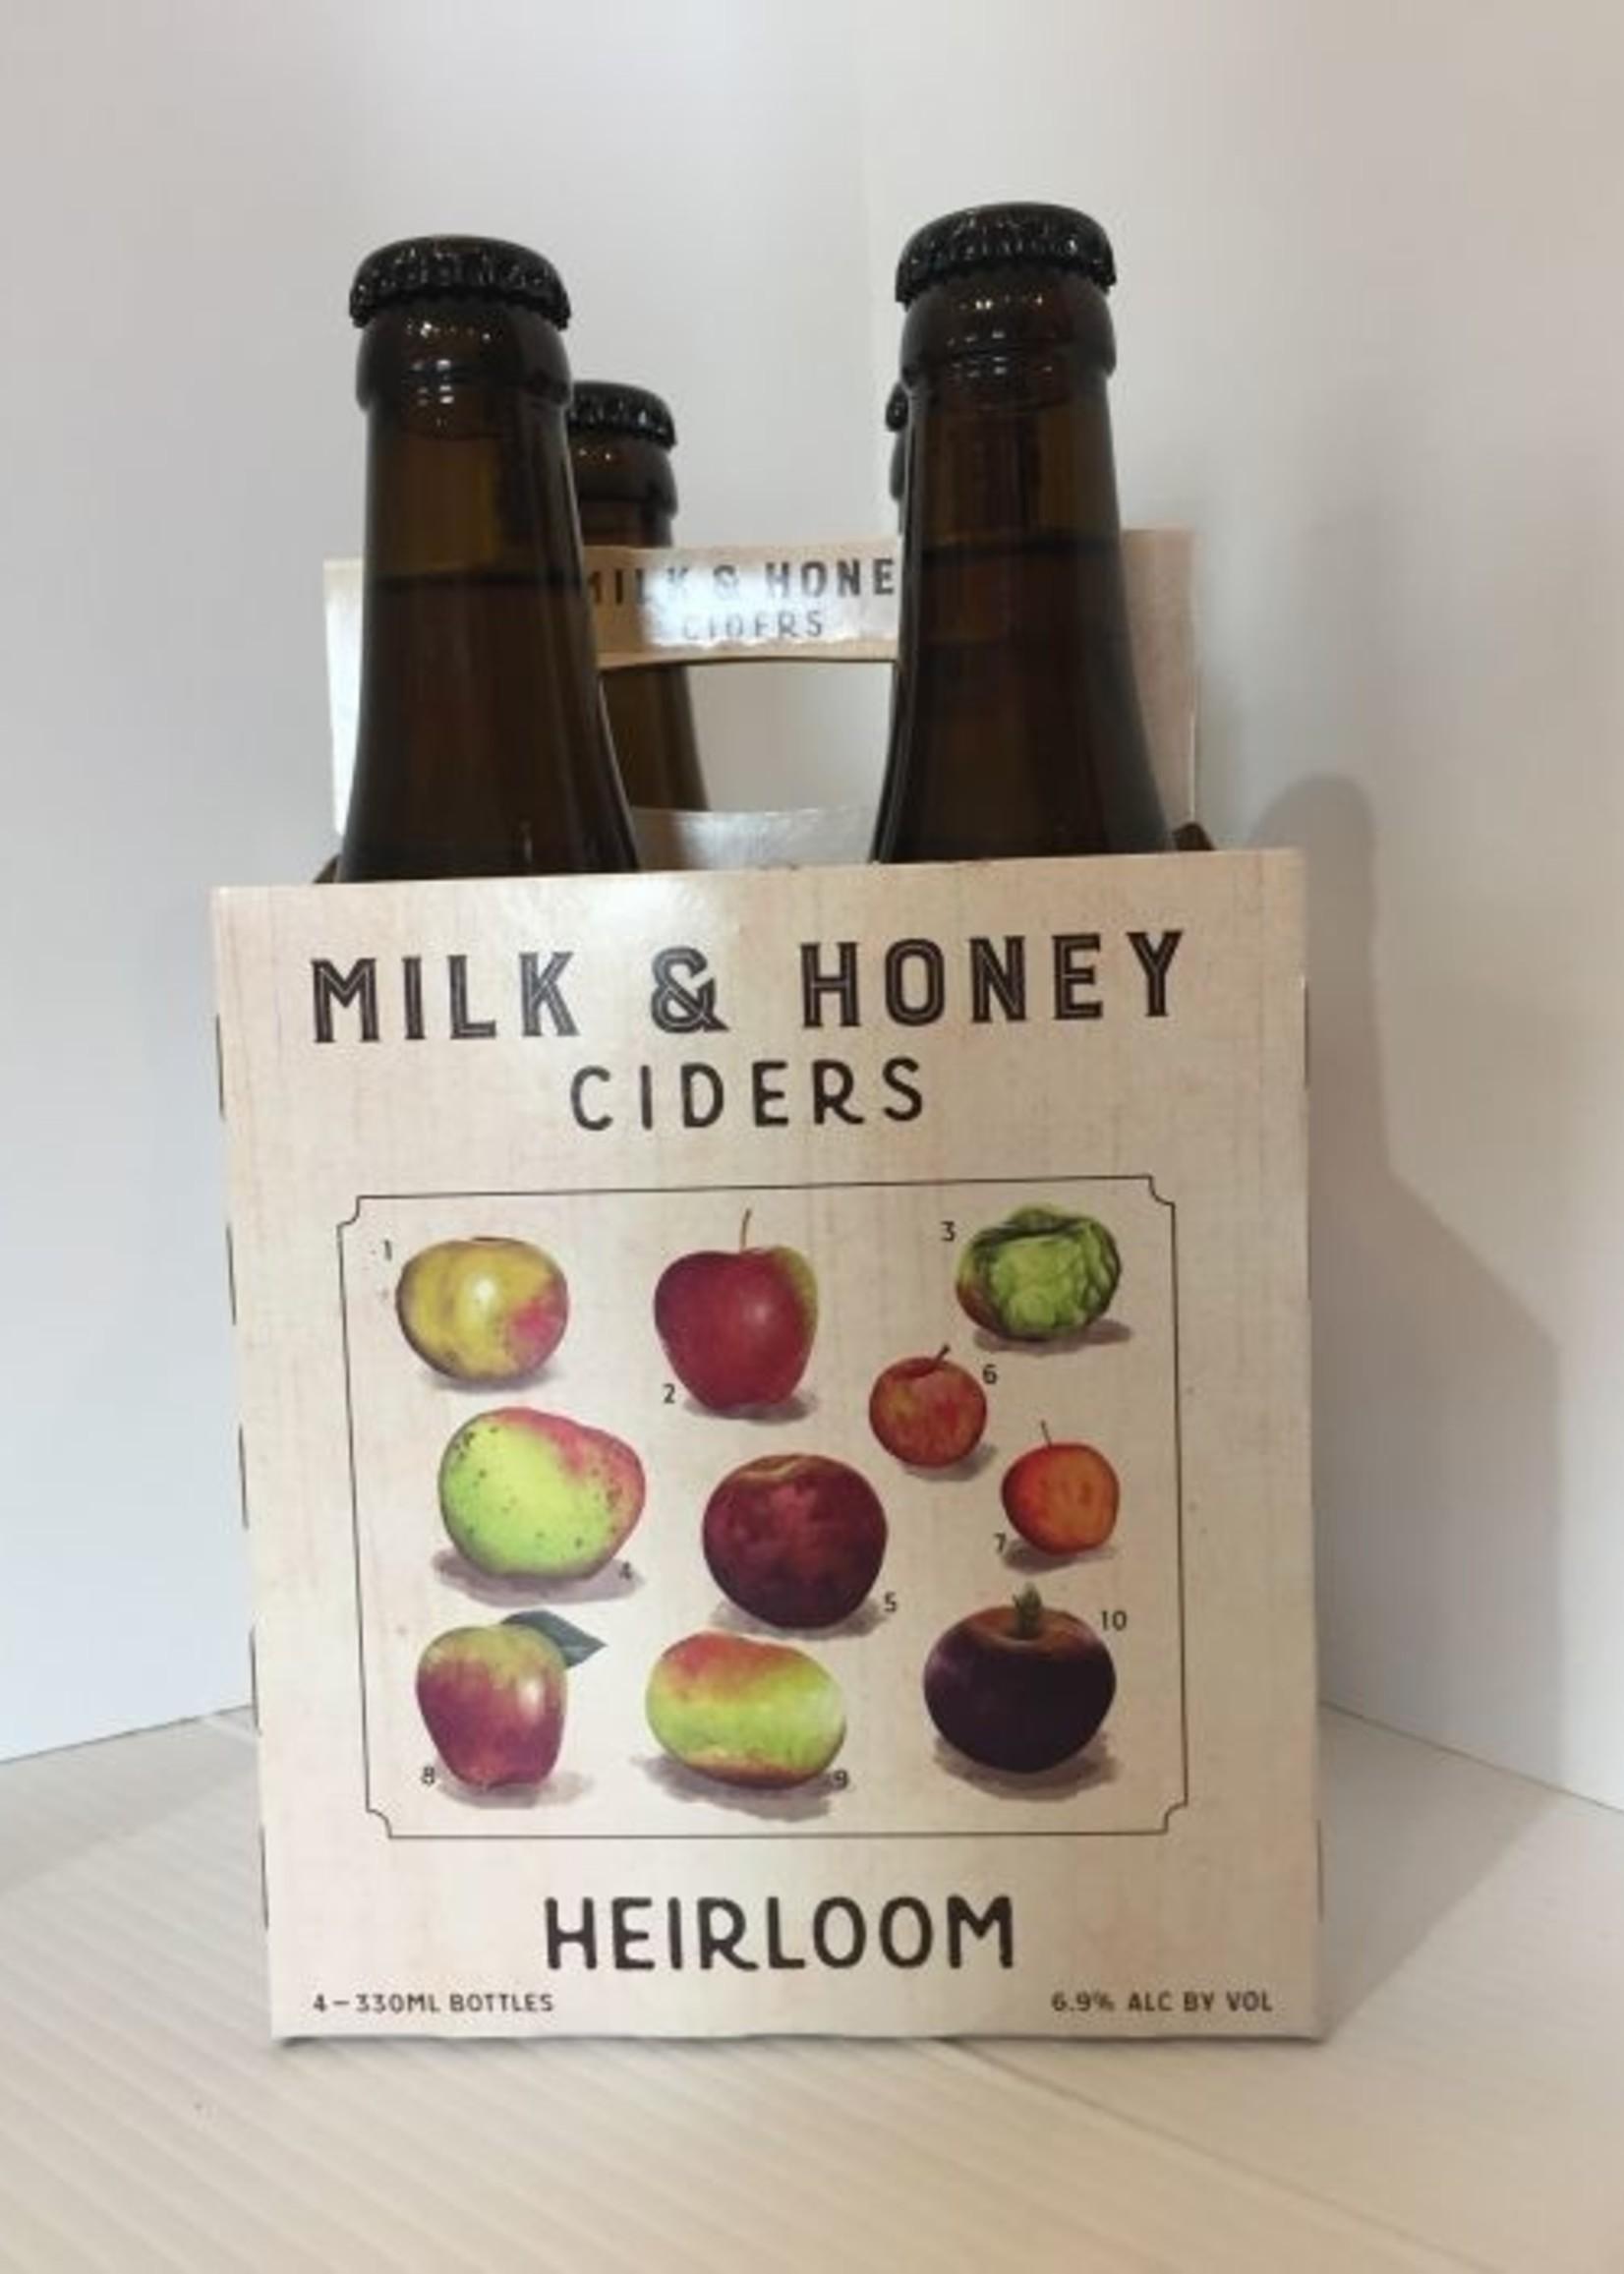 Milk & Honey Heirloom Cider